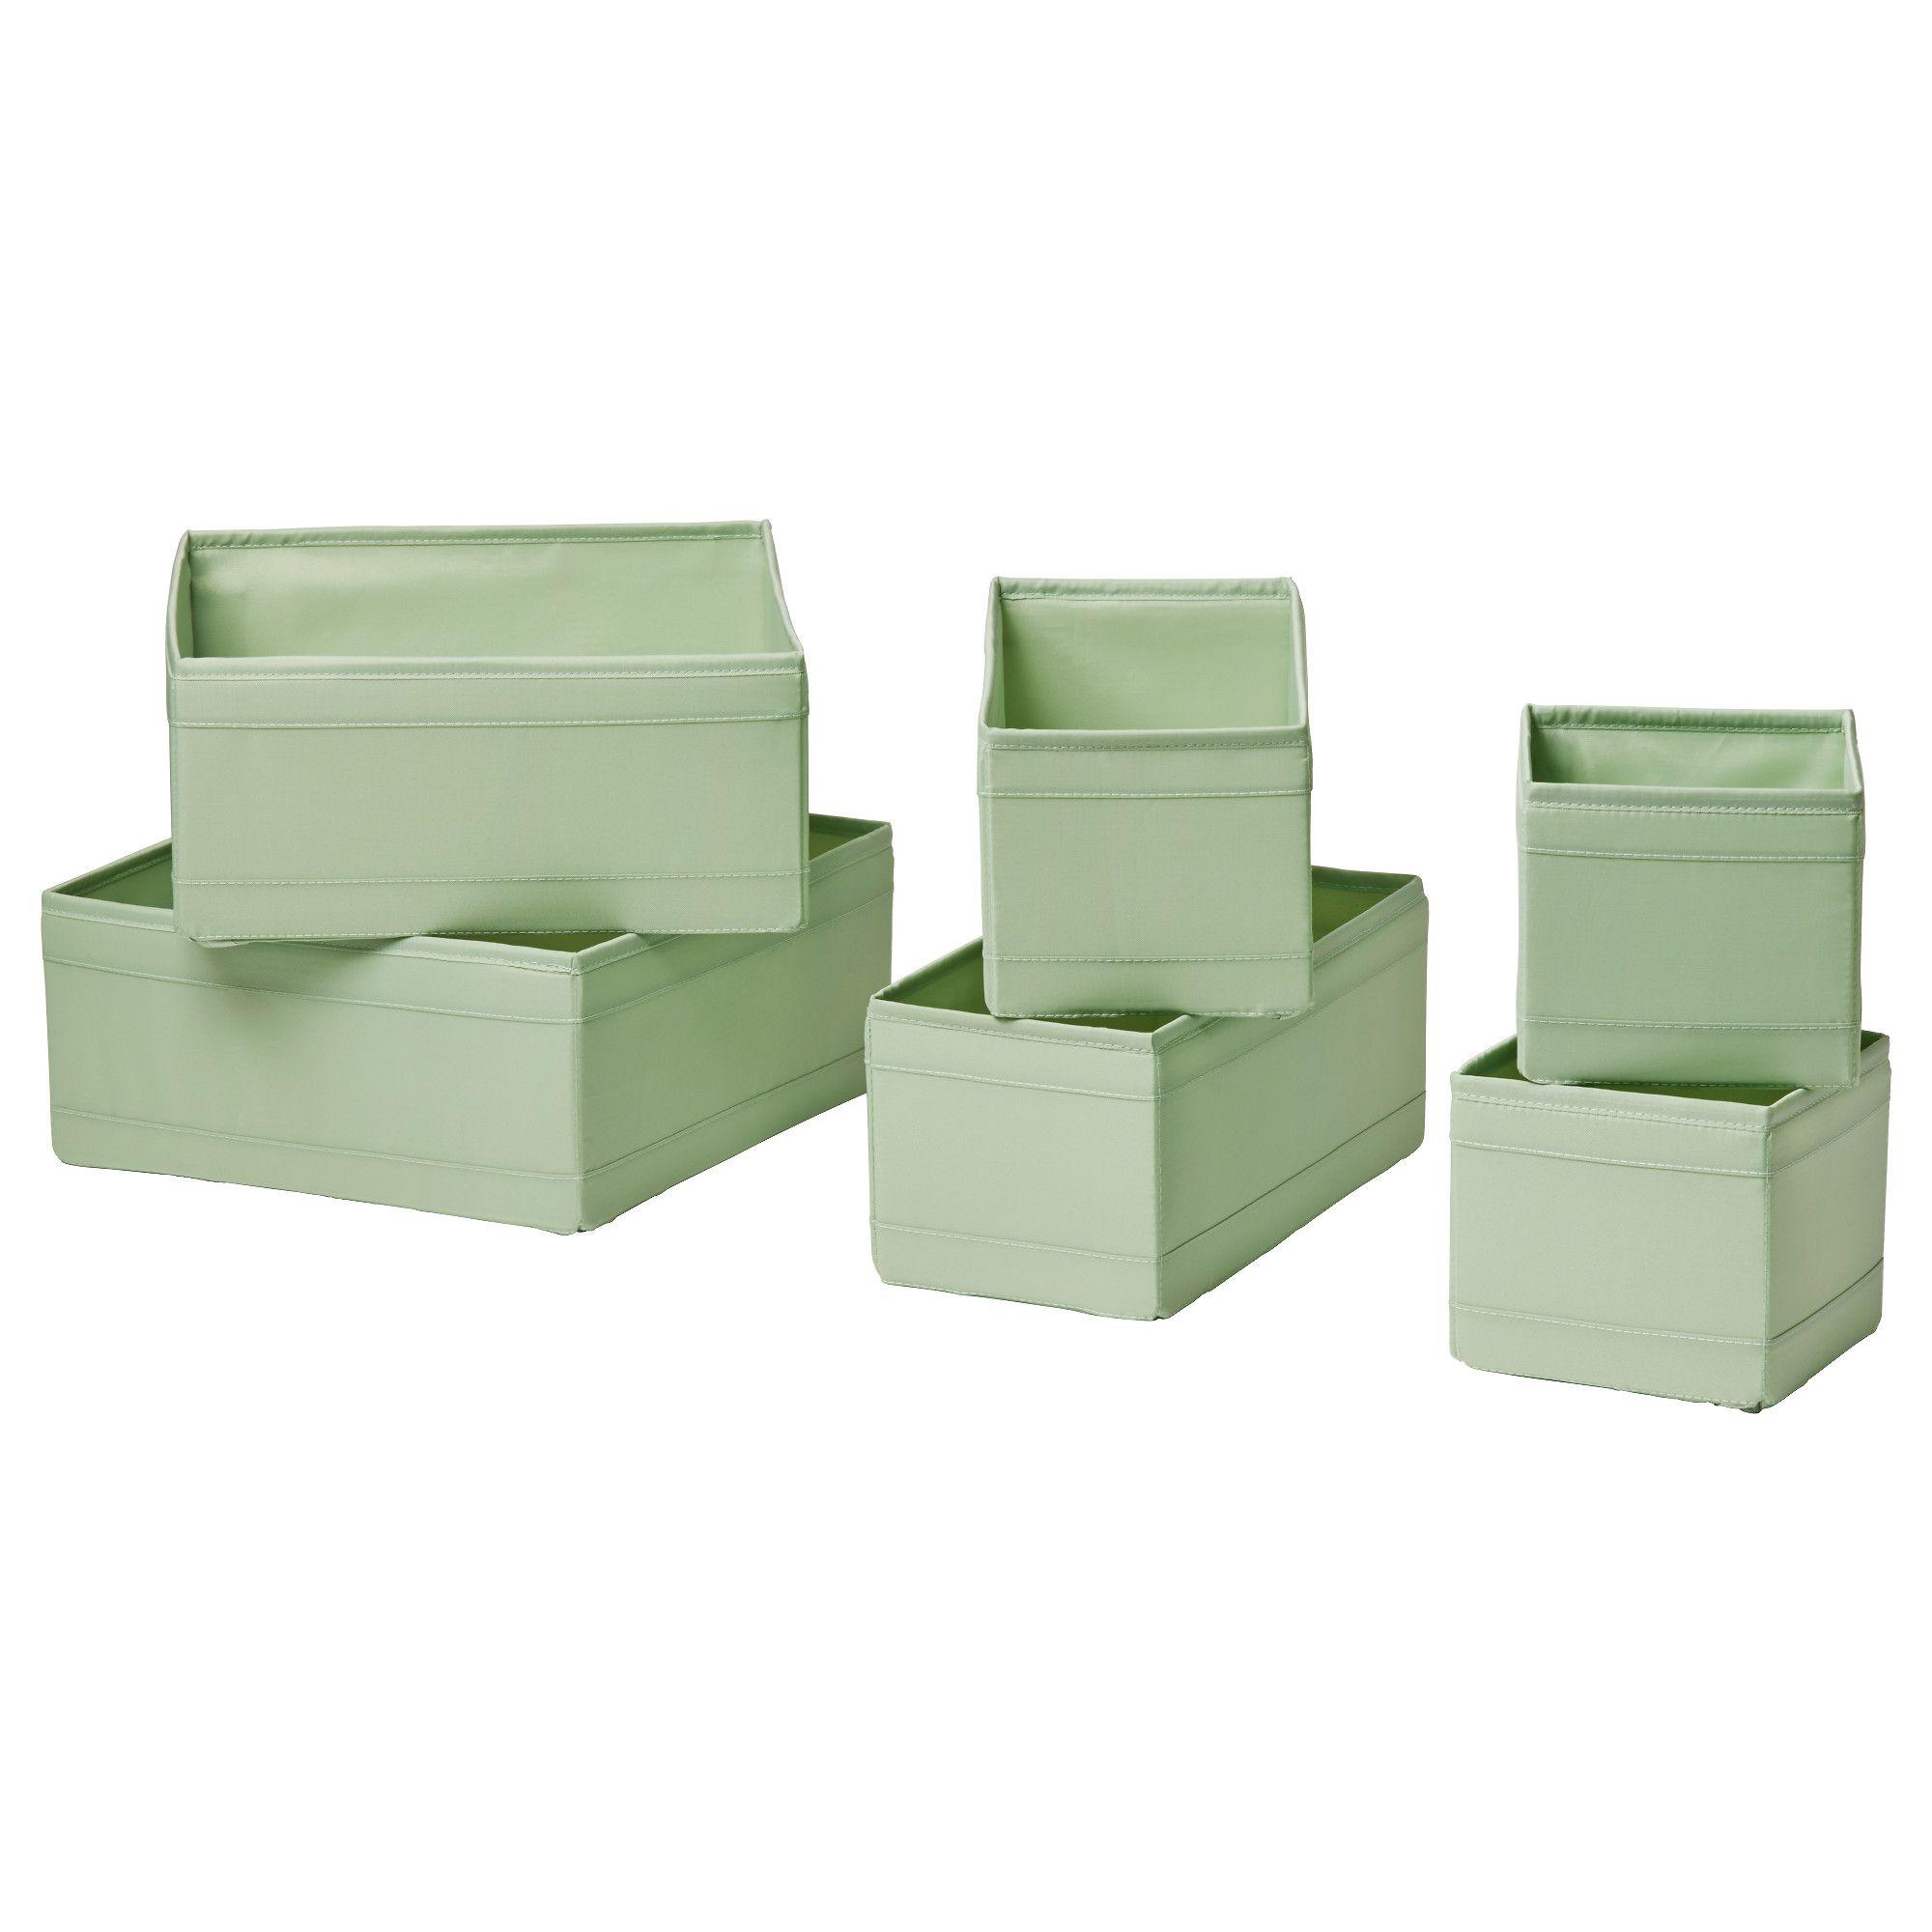 Fresh Home Furnishing Ideas And Affordable Furniture Nightstand Organization Ikea Storage Drawer Organizers